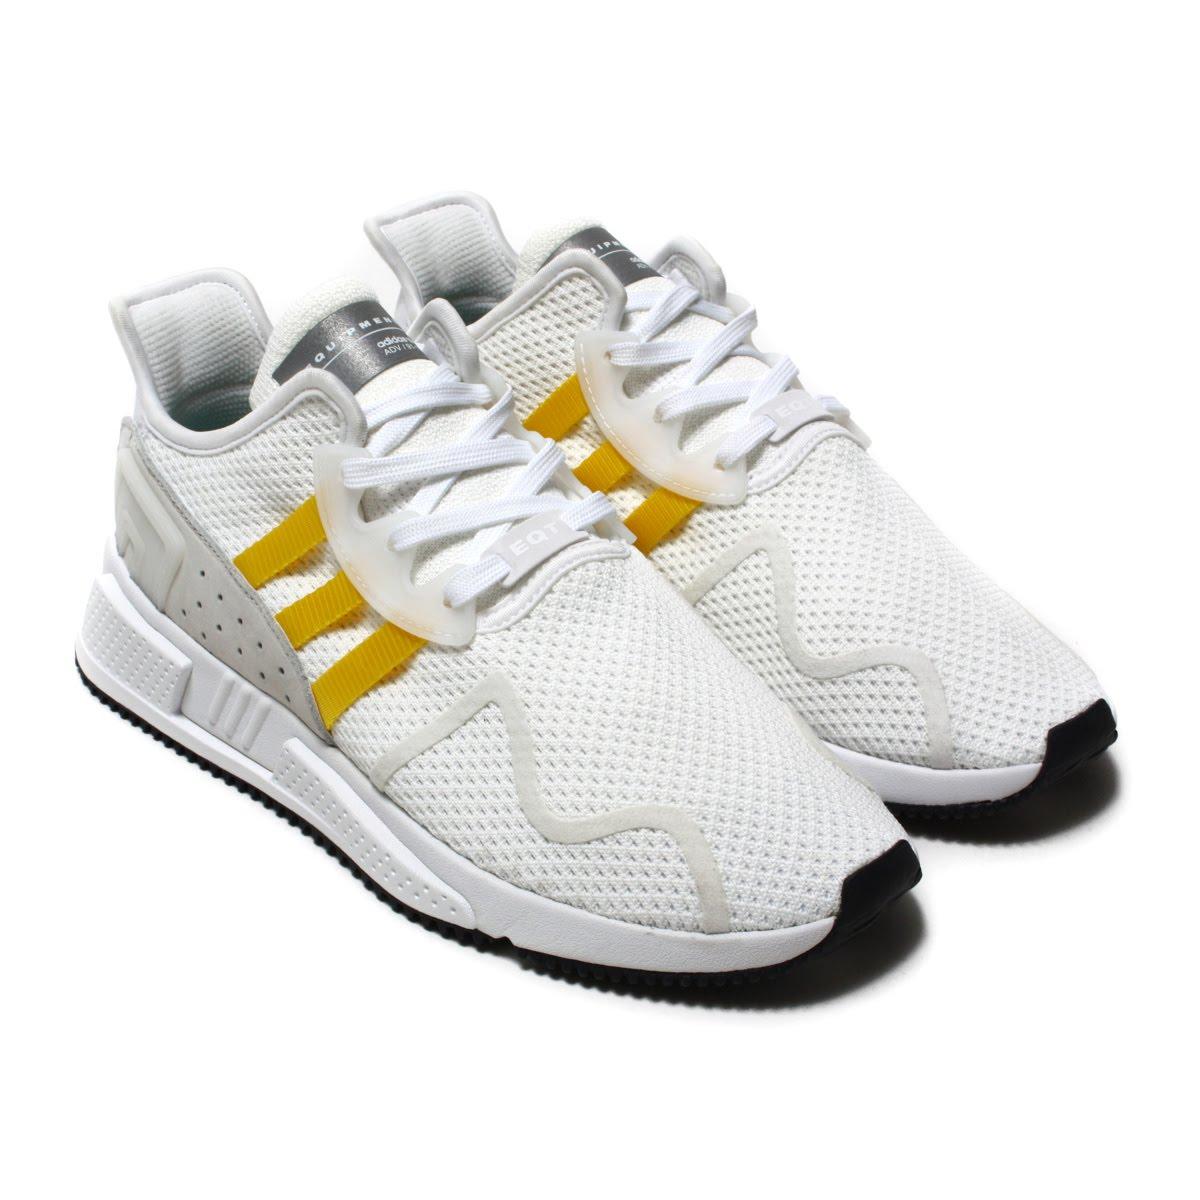 adidas Originals EQT CUSHION ADV(アディダス オリジナルス イーキューティー クッション ADV)Running White/Eqt Yellow/Silver Met【メンズ スニーカー】18SS-I